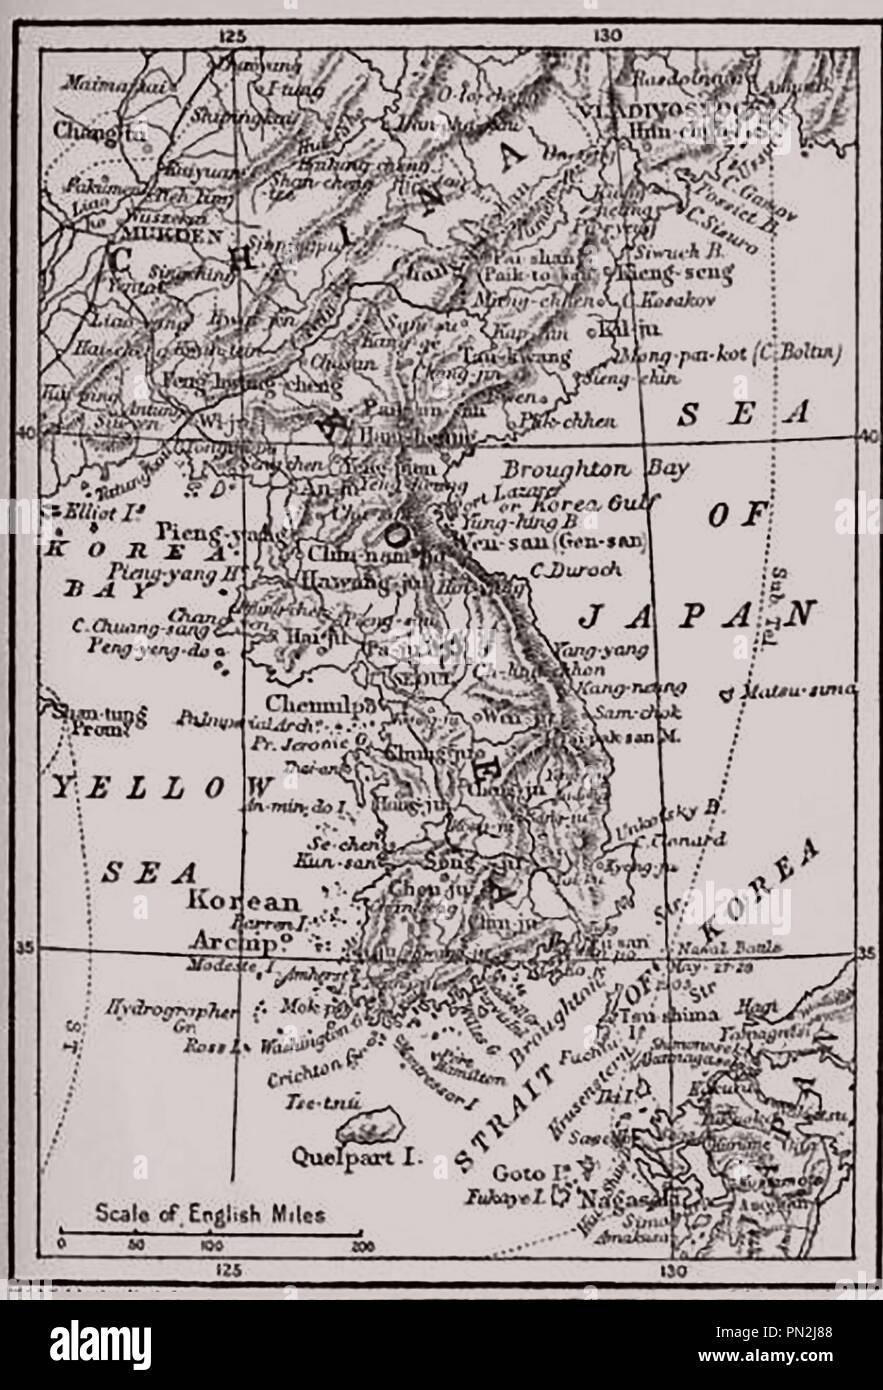 A 1910 map of Korea, the Sea of Japan, Yellow Sea,strait of Korea and Korea Bay - Stock Image